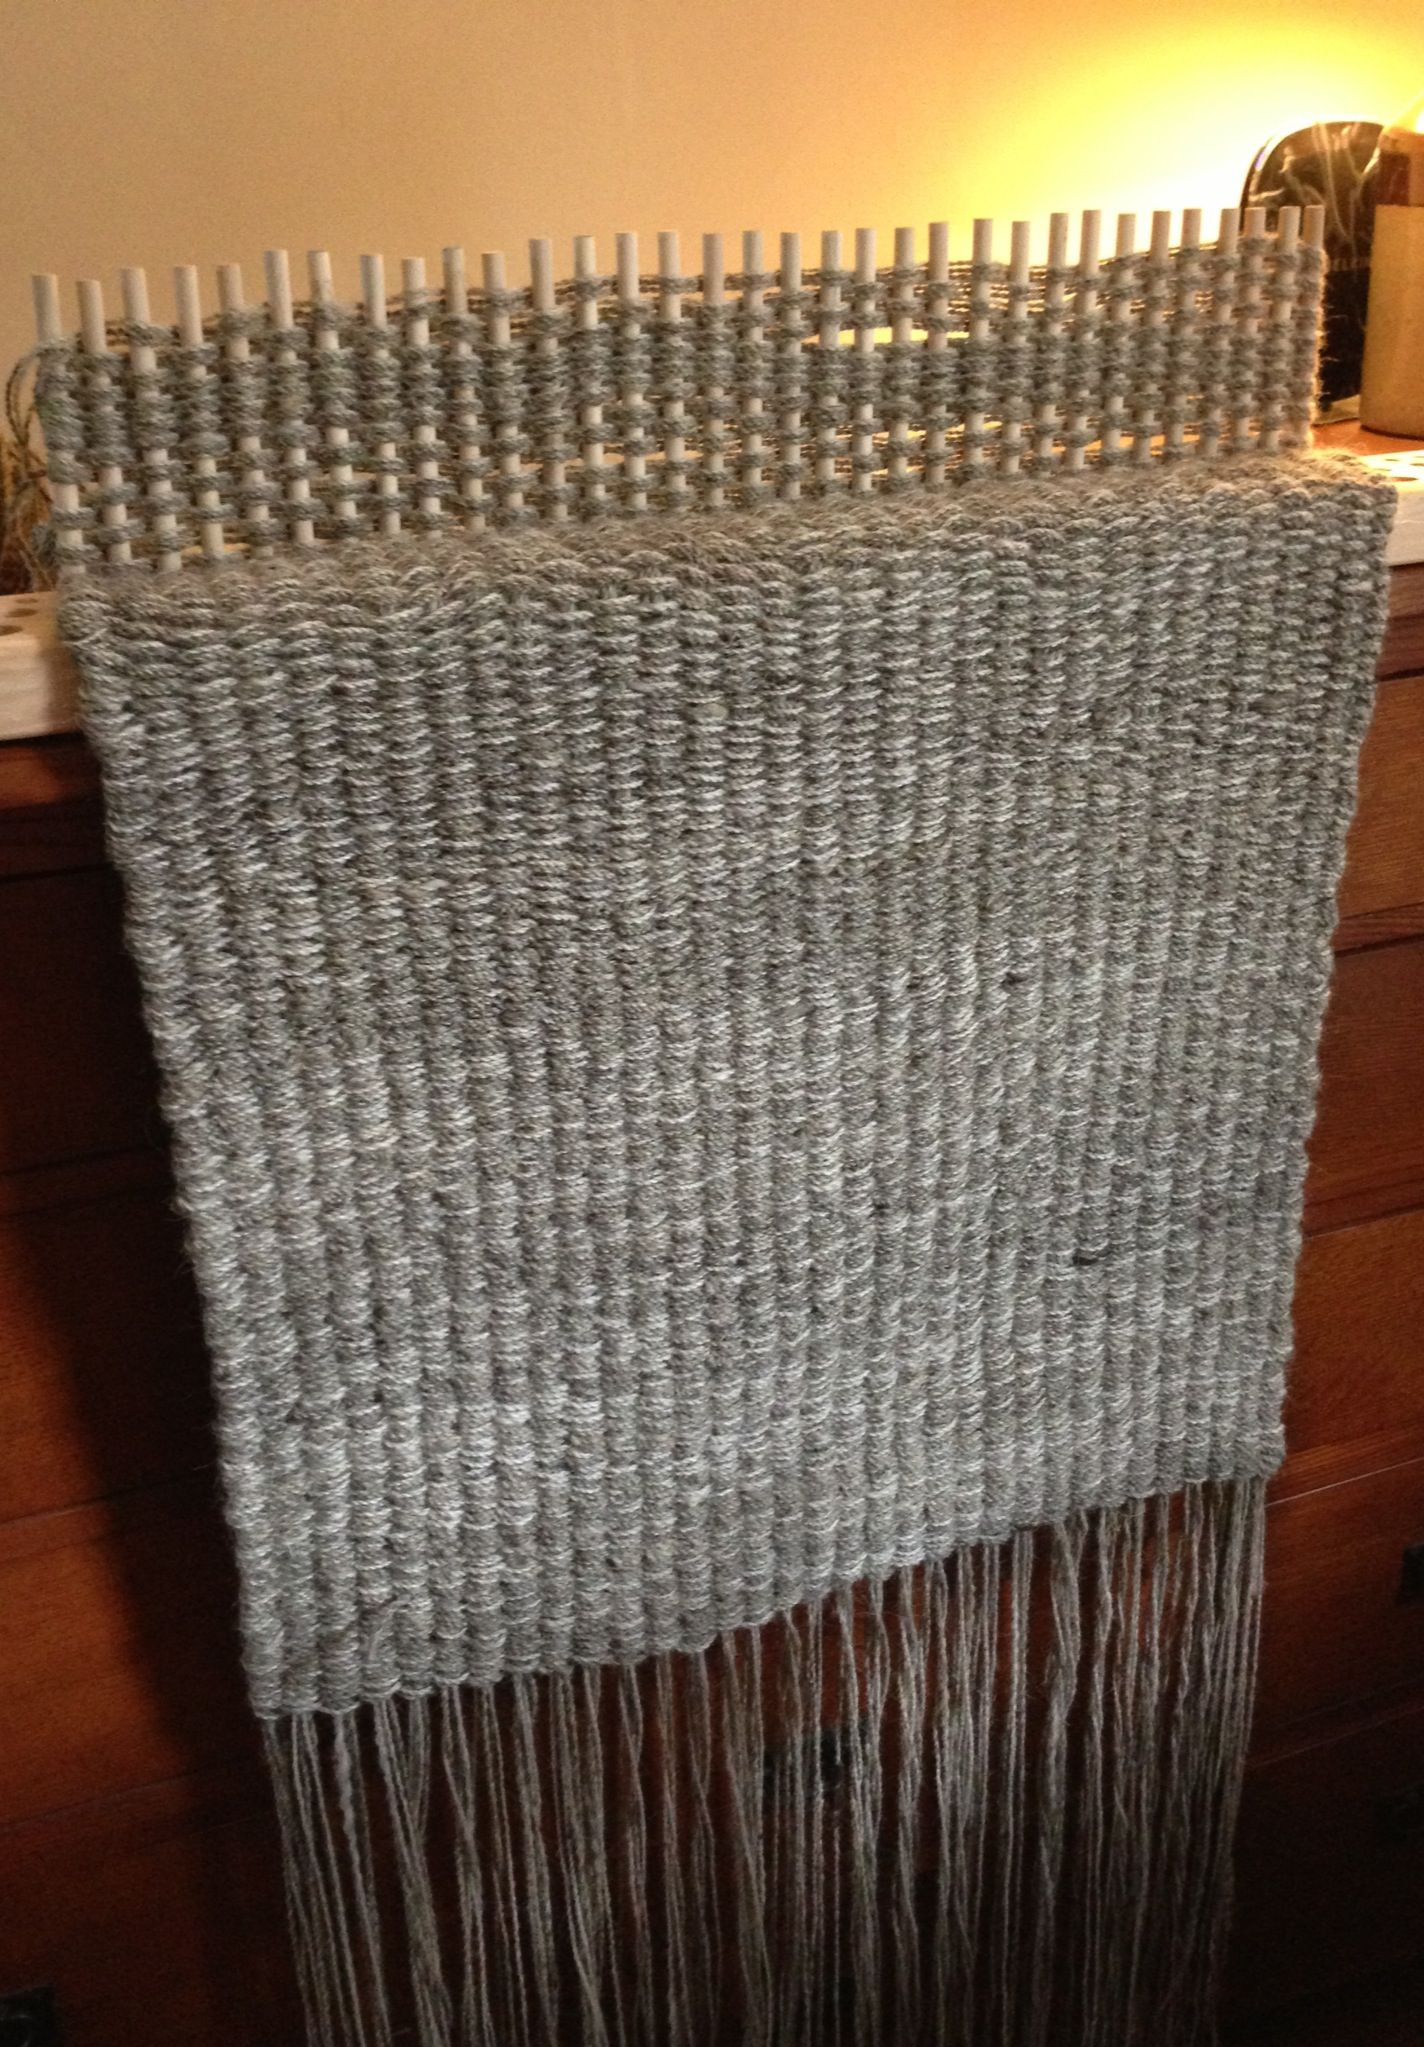 Peg Loom Weaving In Progress Using Our Own Navajo Churro